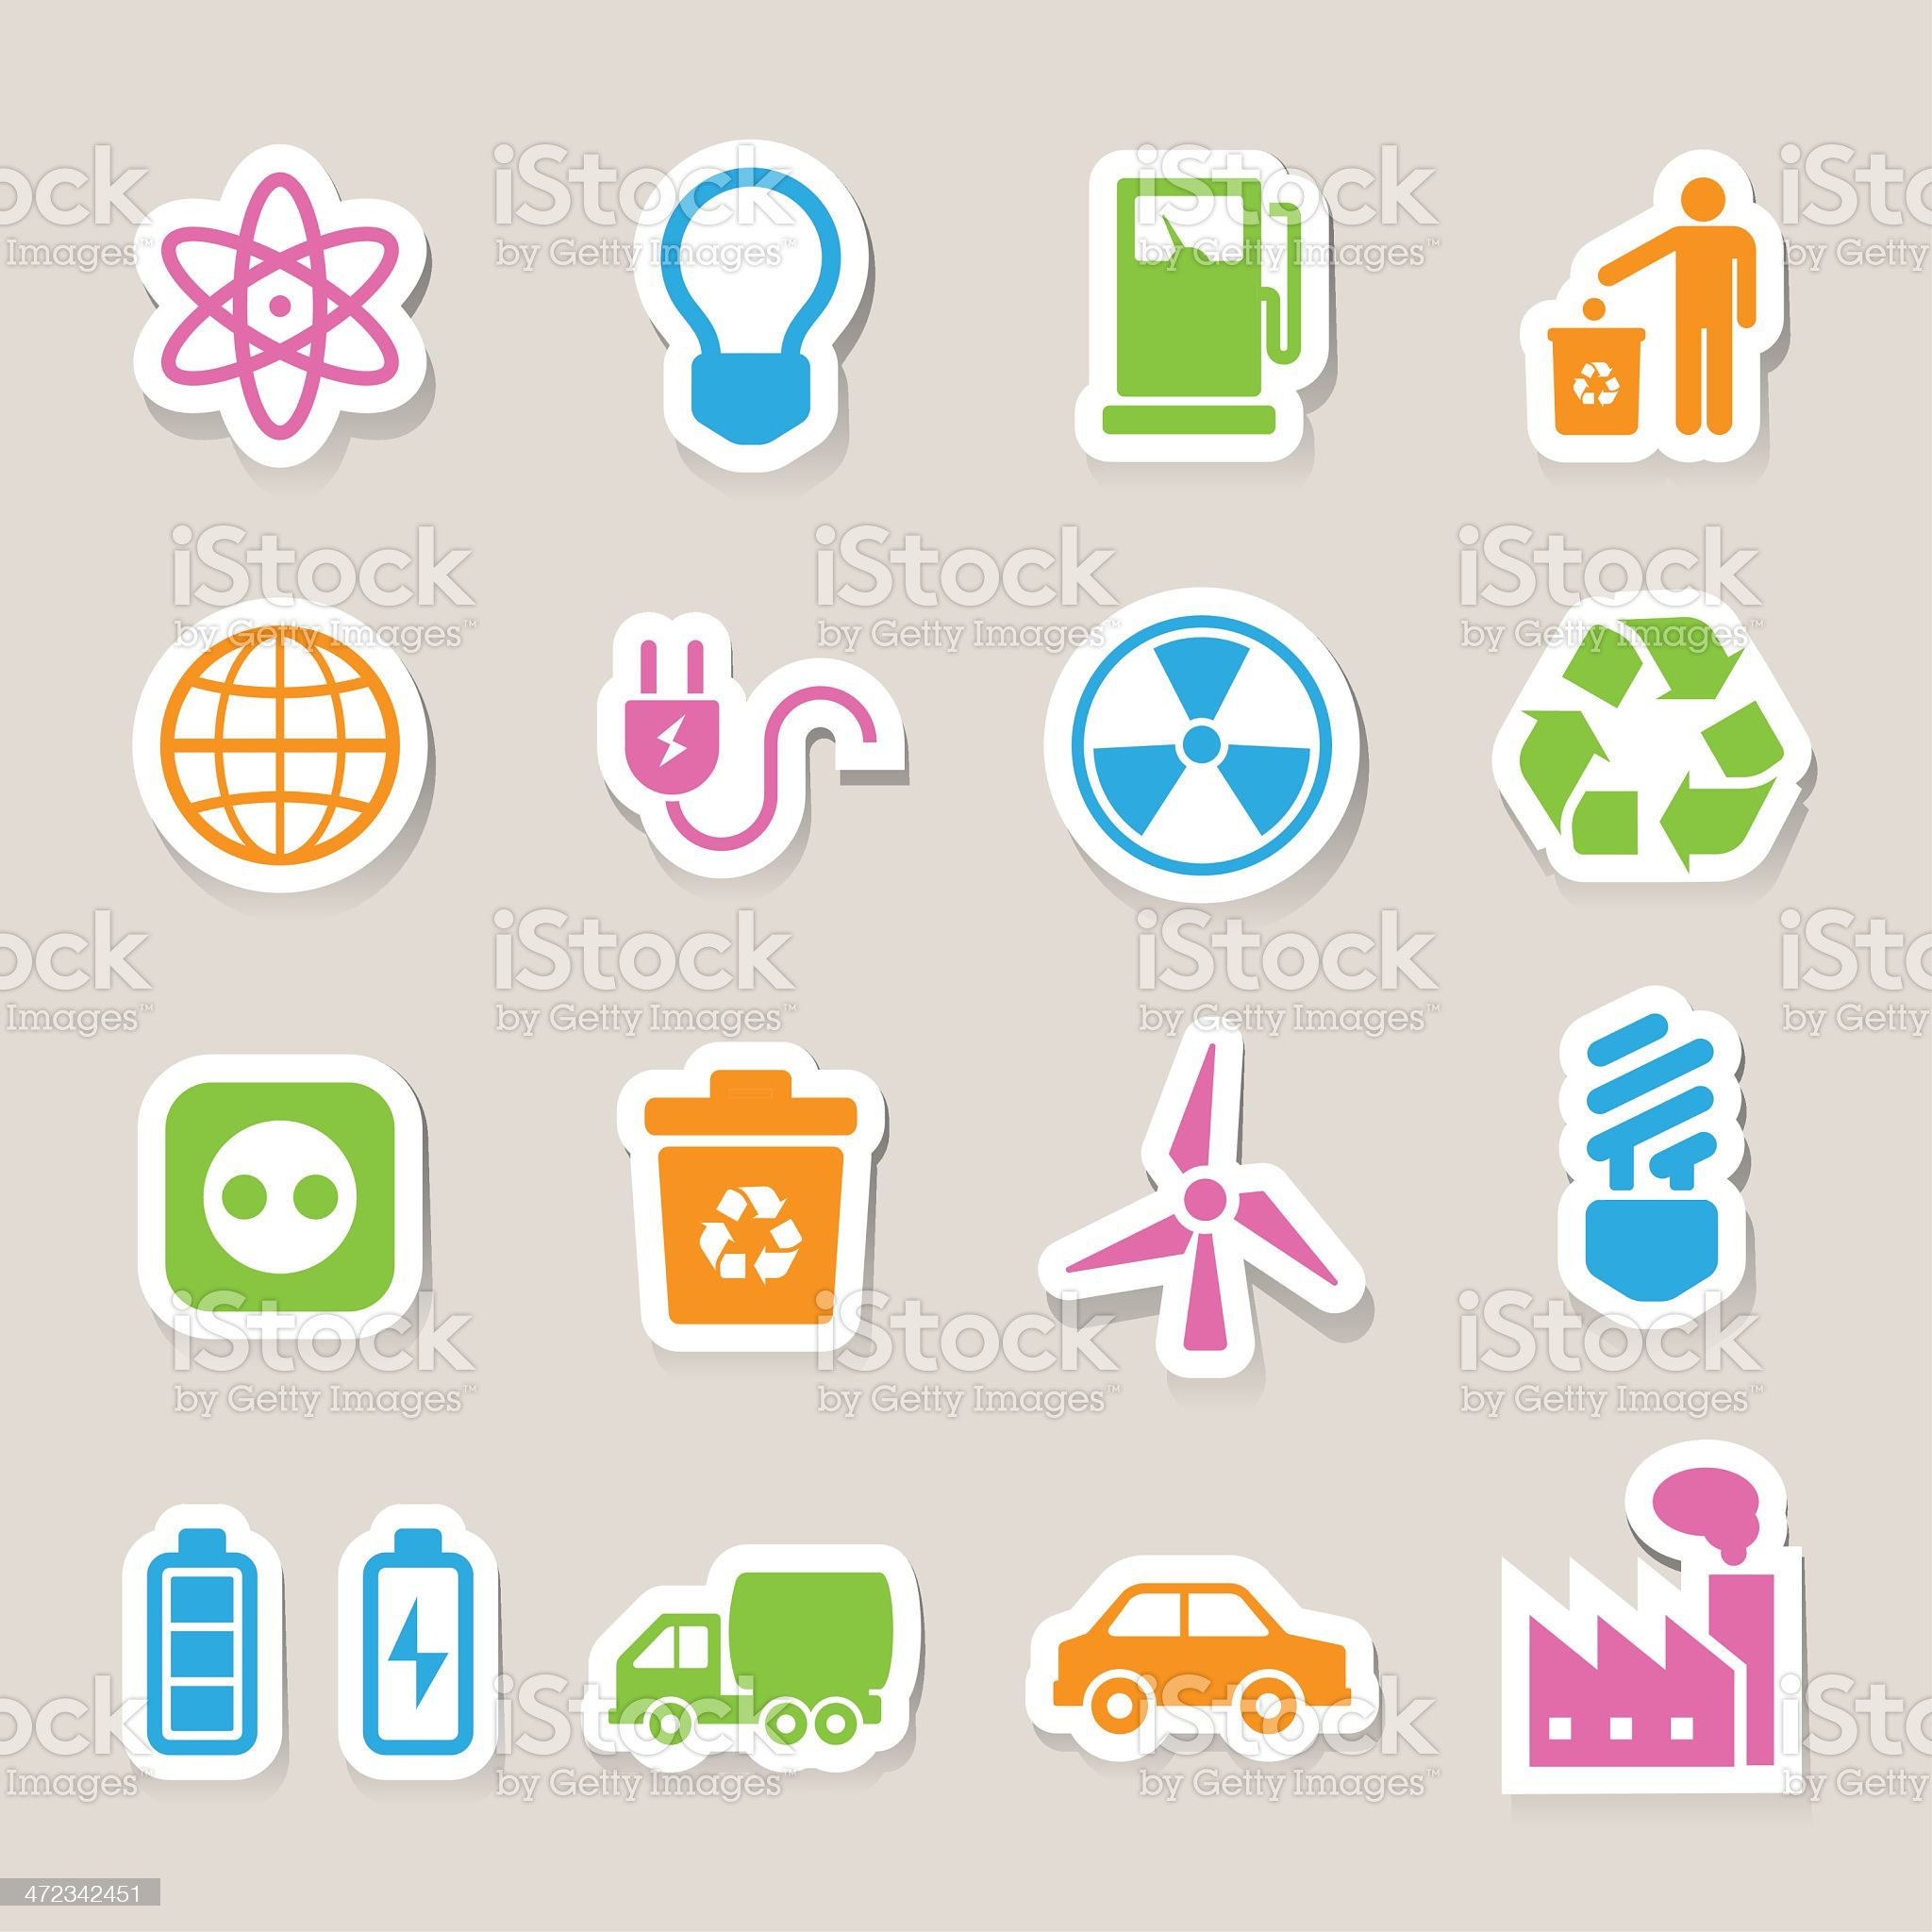 Eco energy icons set royalty-free stock vector art